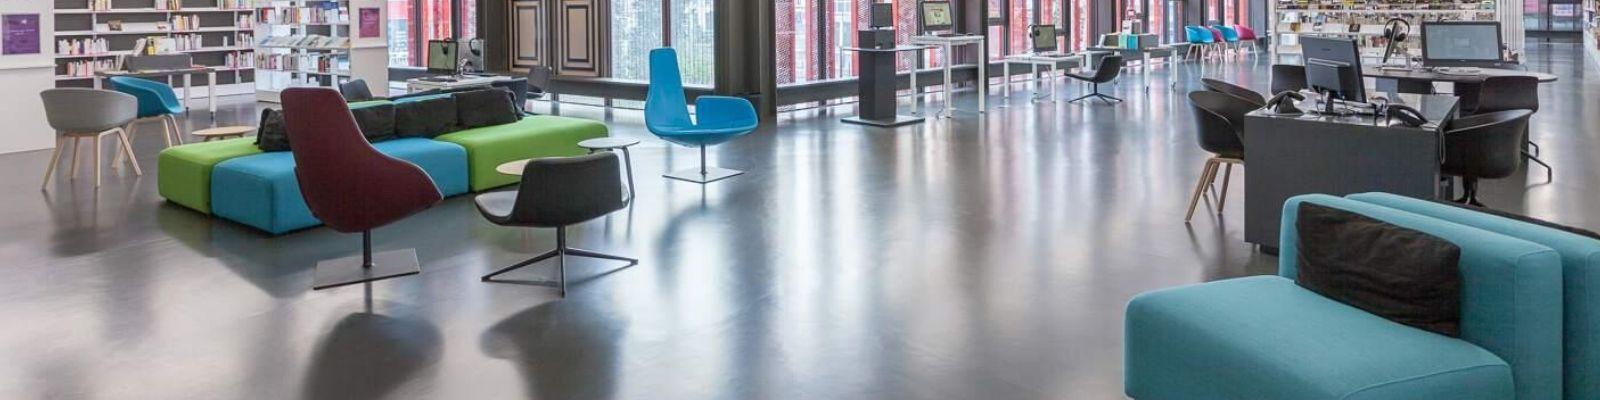 pavimenti residenziali e industriali